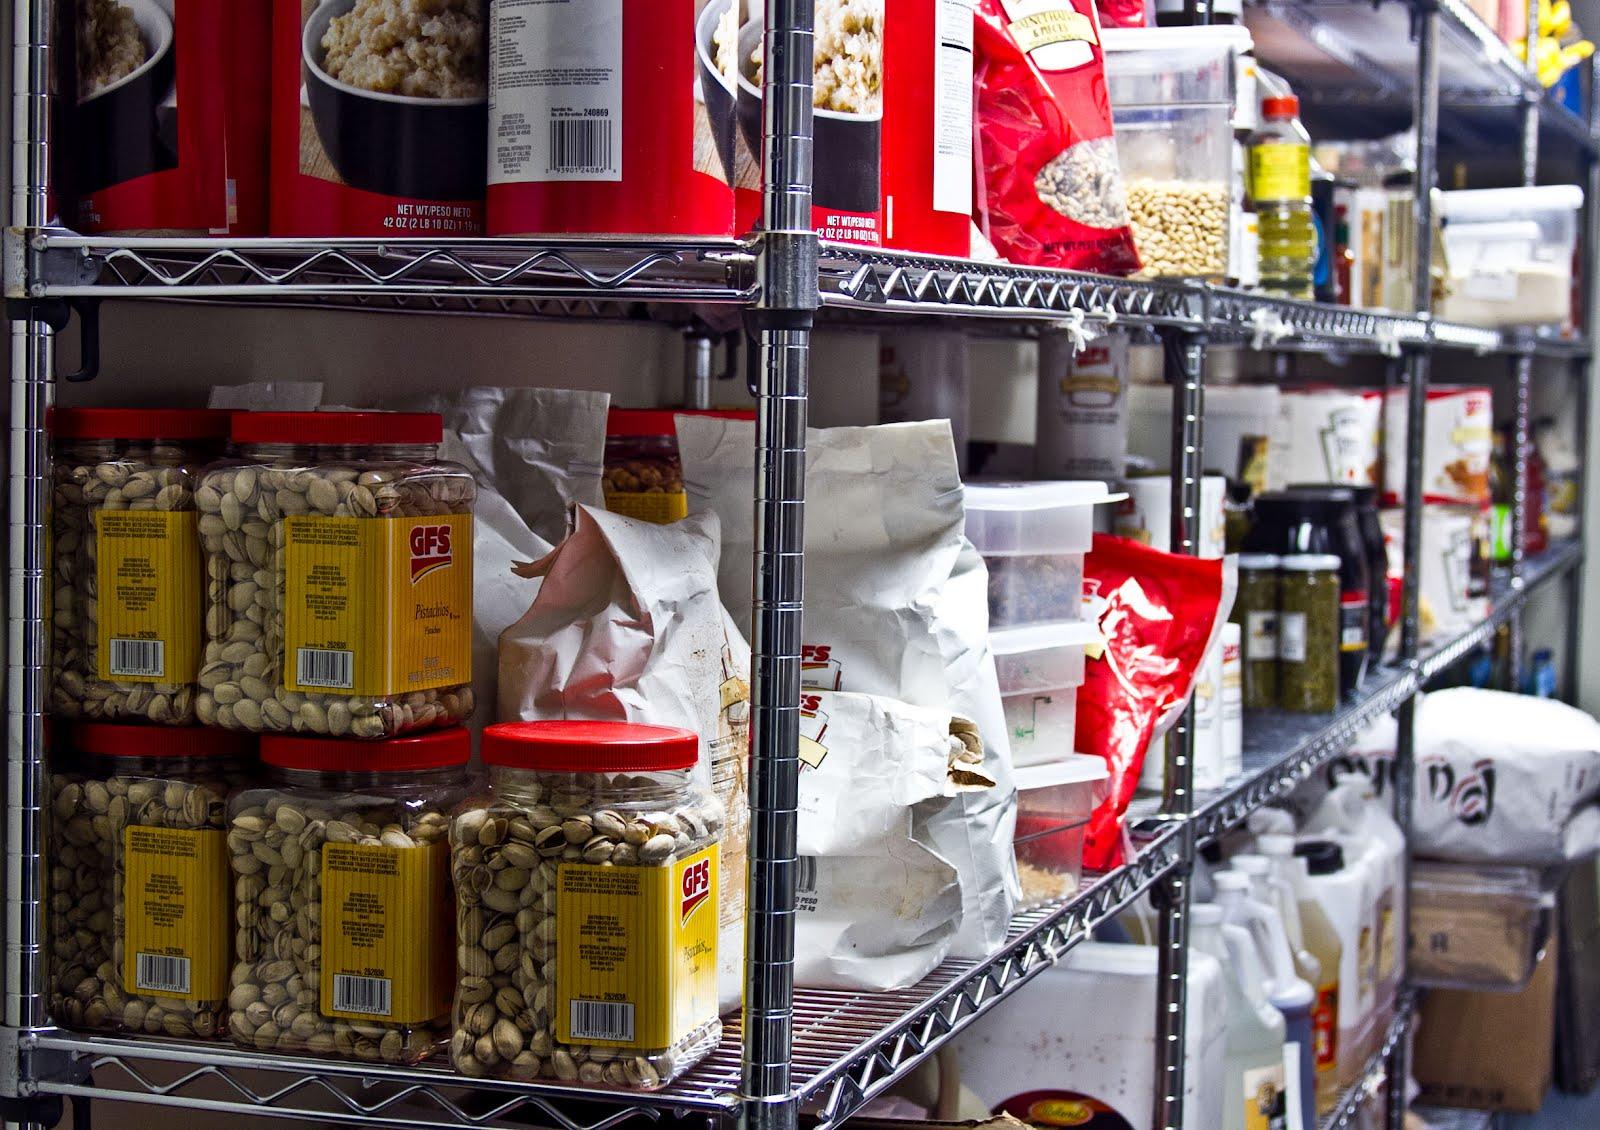 An upscale Italian restaurant's pantry stocked full using a 5 shelf unit.